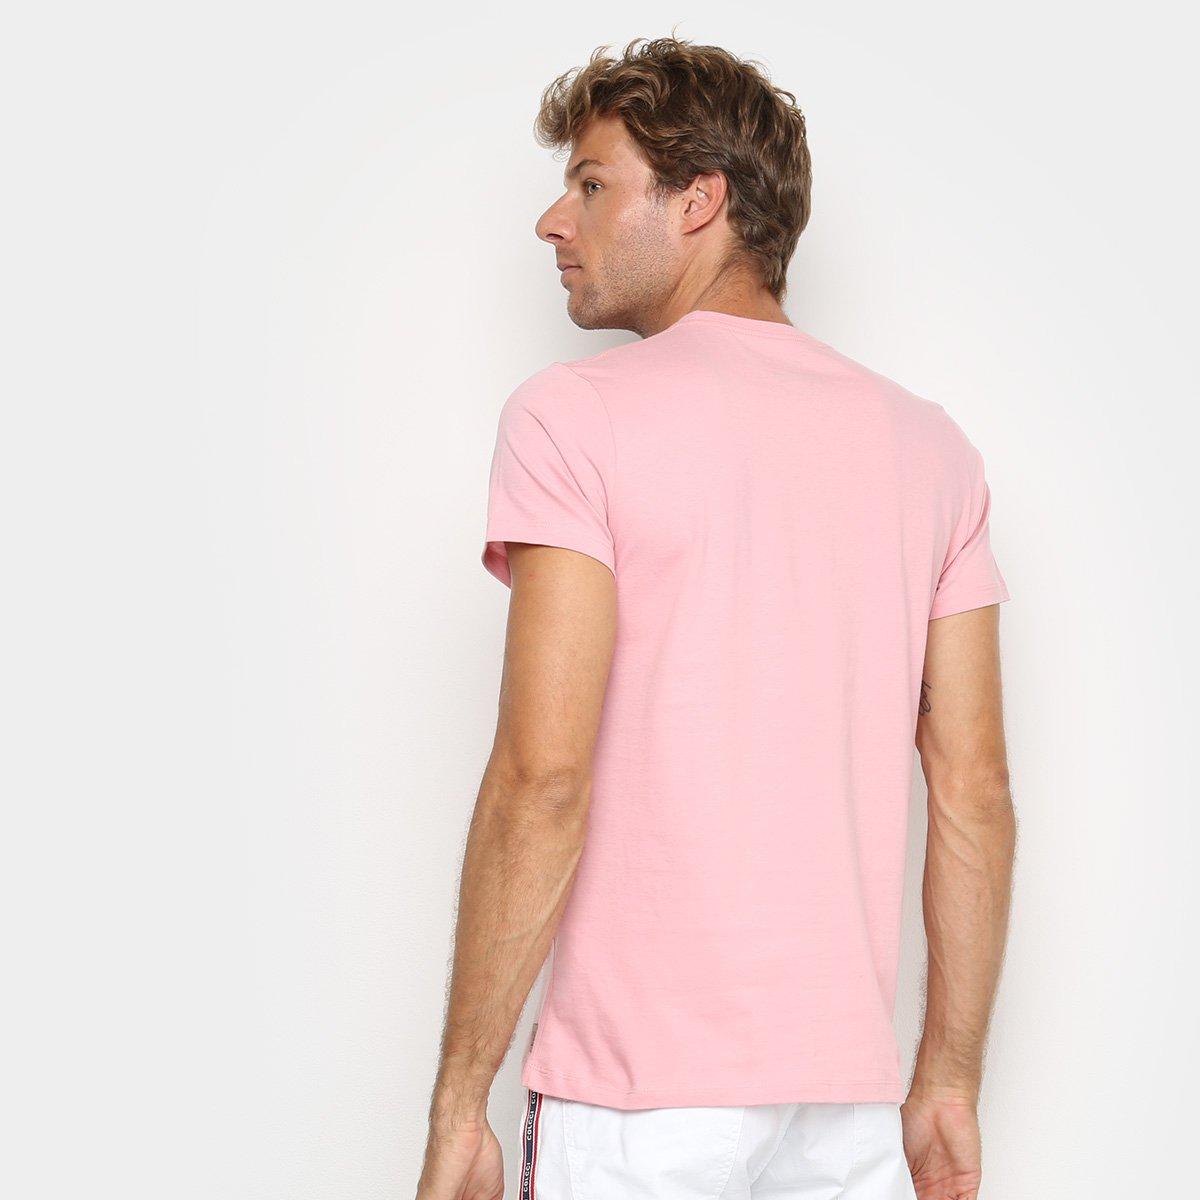 Camiseta Colcci Estampada Manga Curta Masculina - Rosa